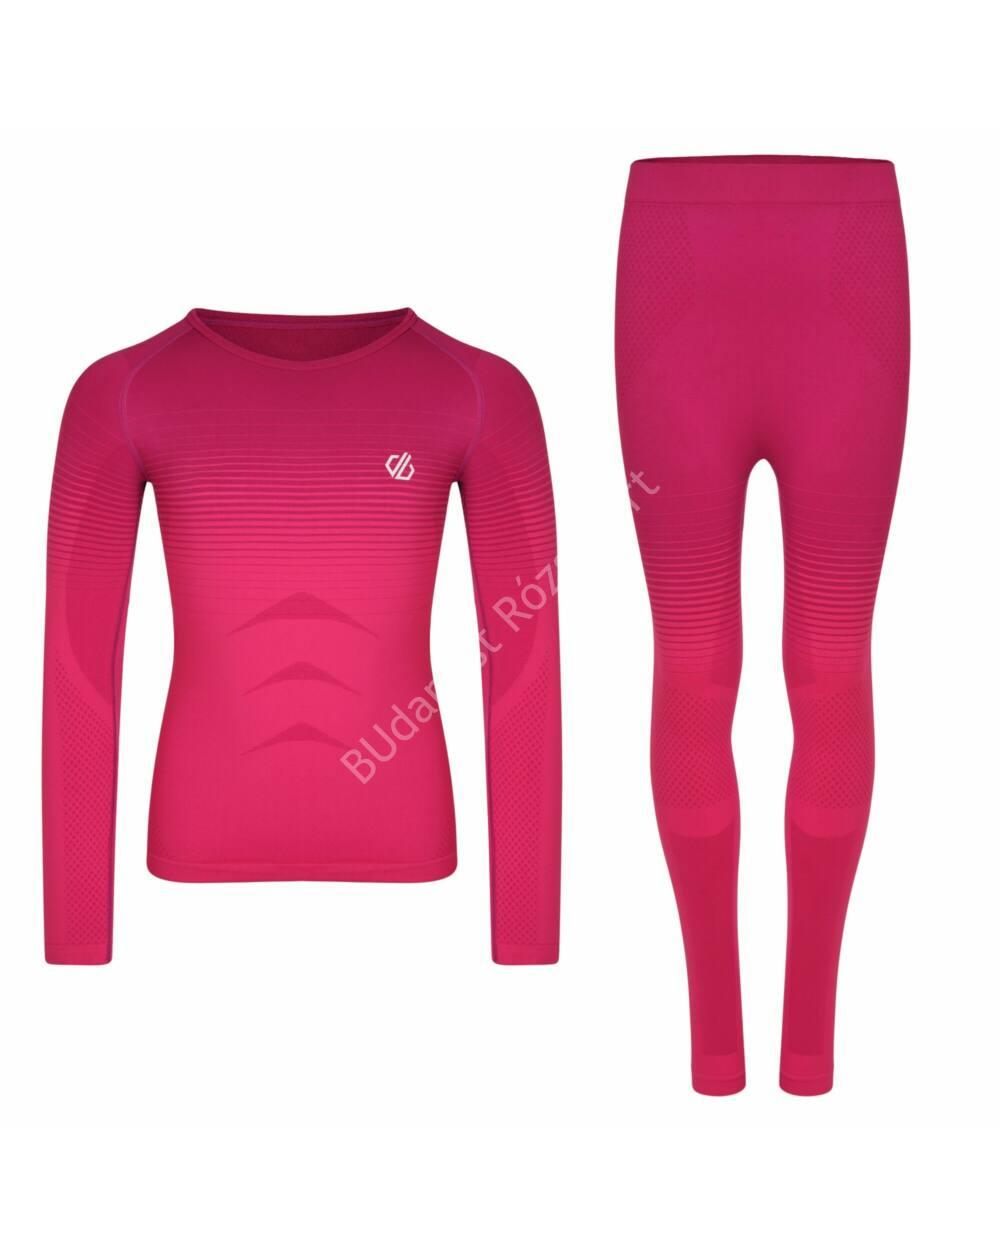 Dare2b In the Zone gyerek aláöltözet szett, cyber pink, 152-164 cm